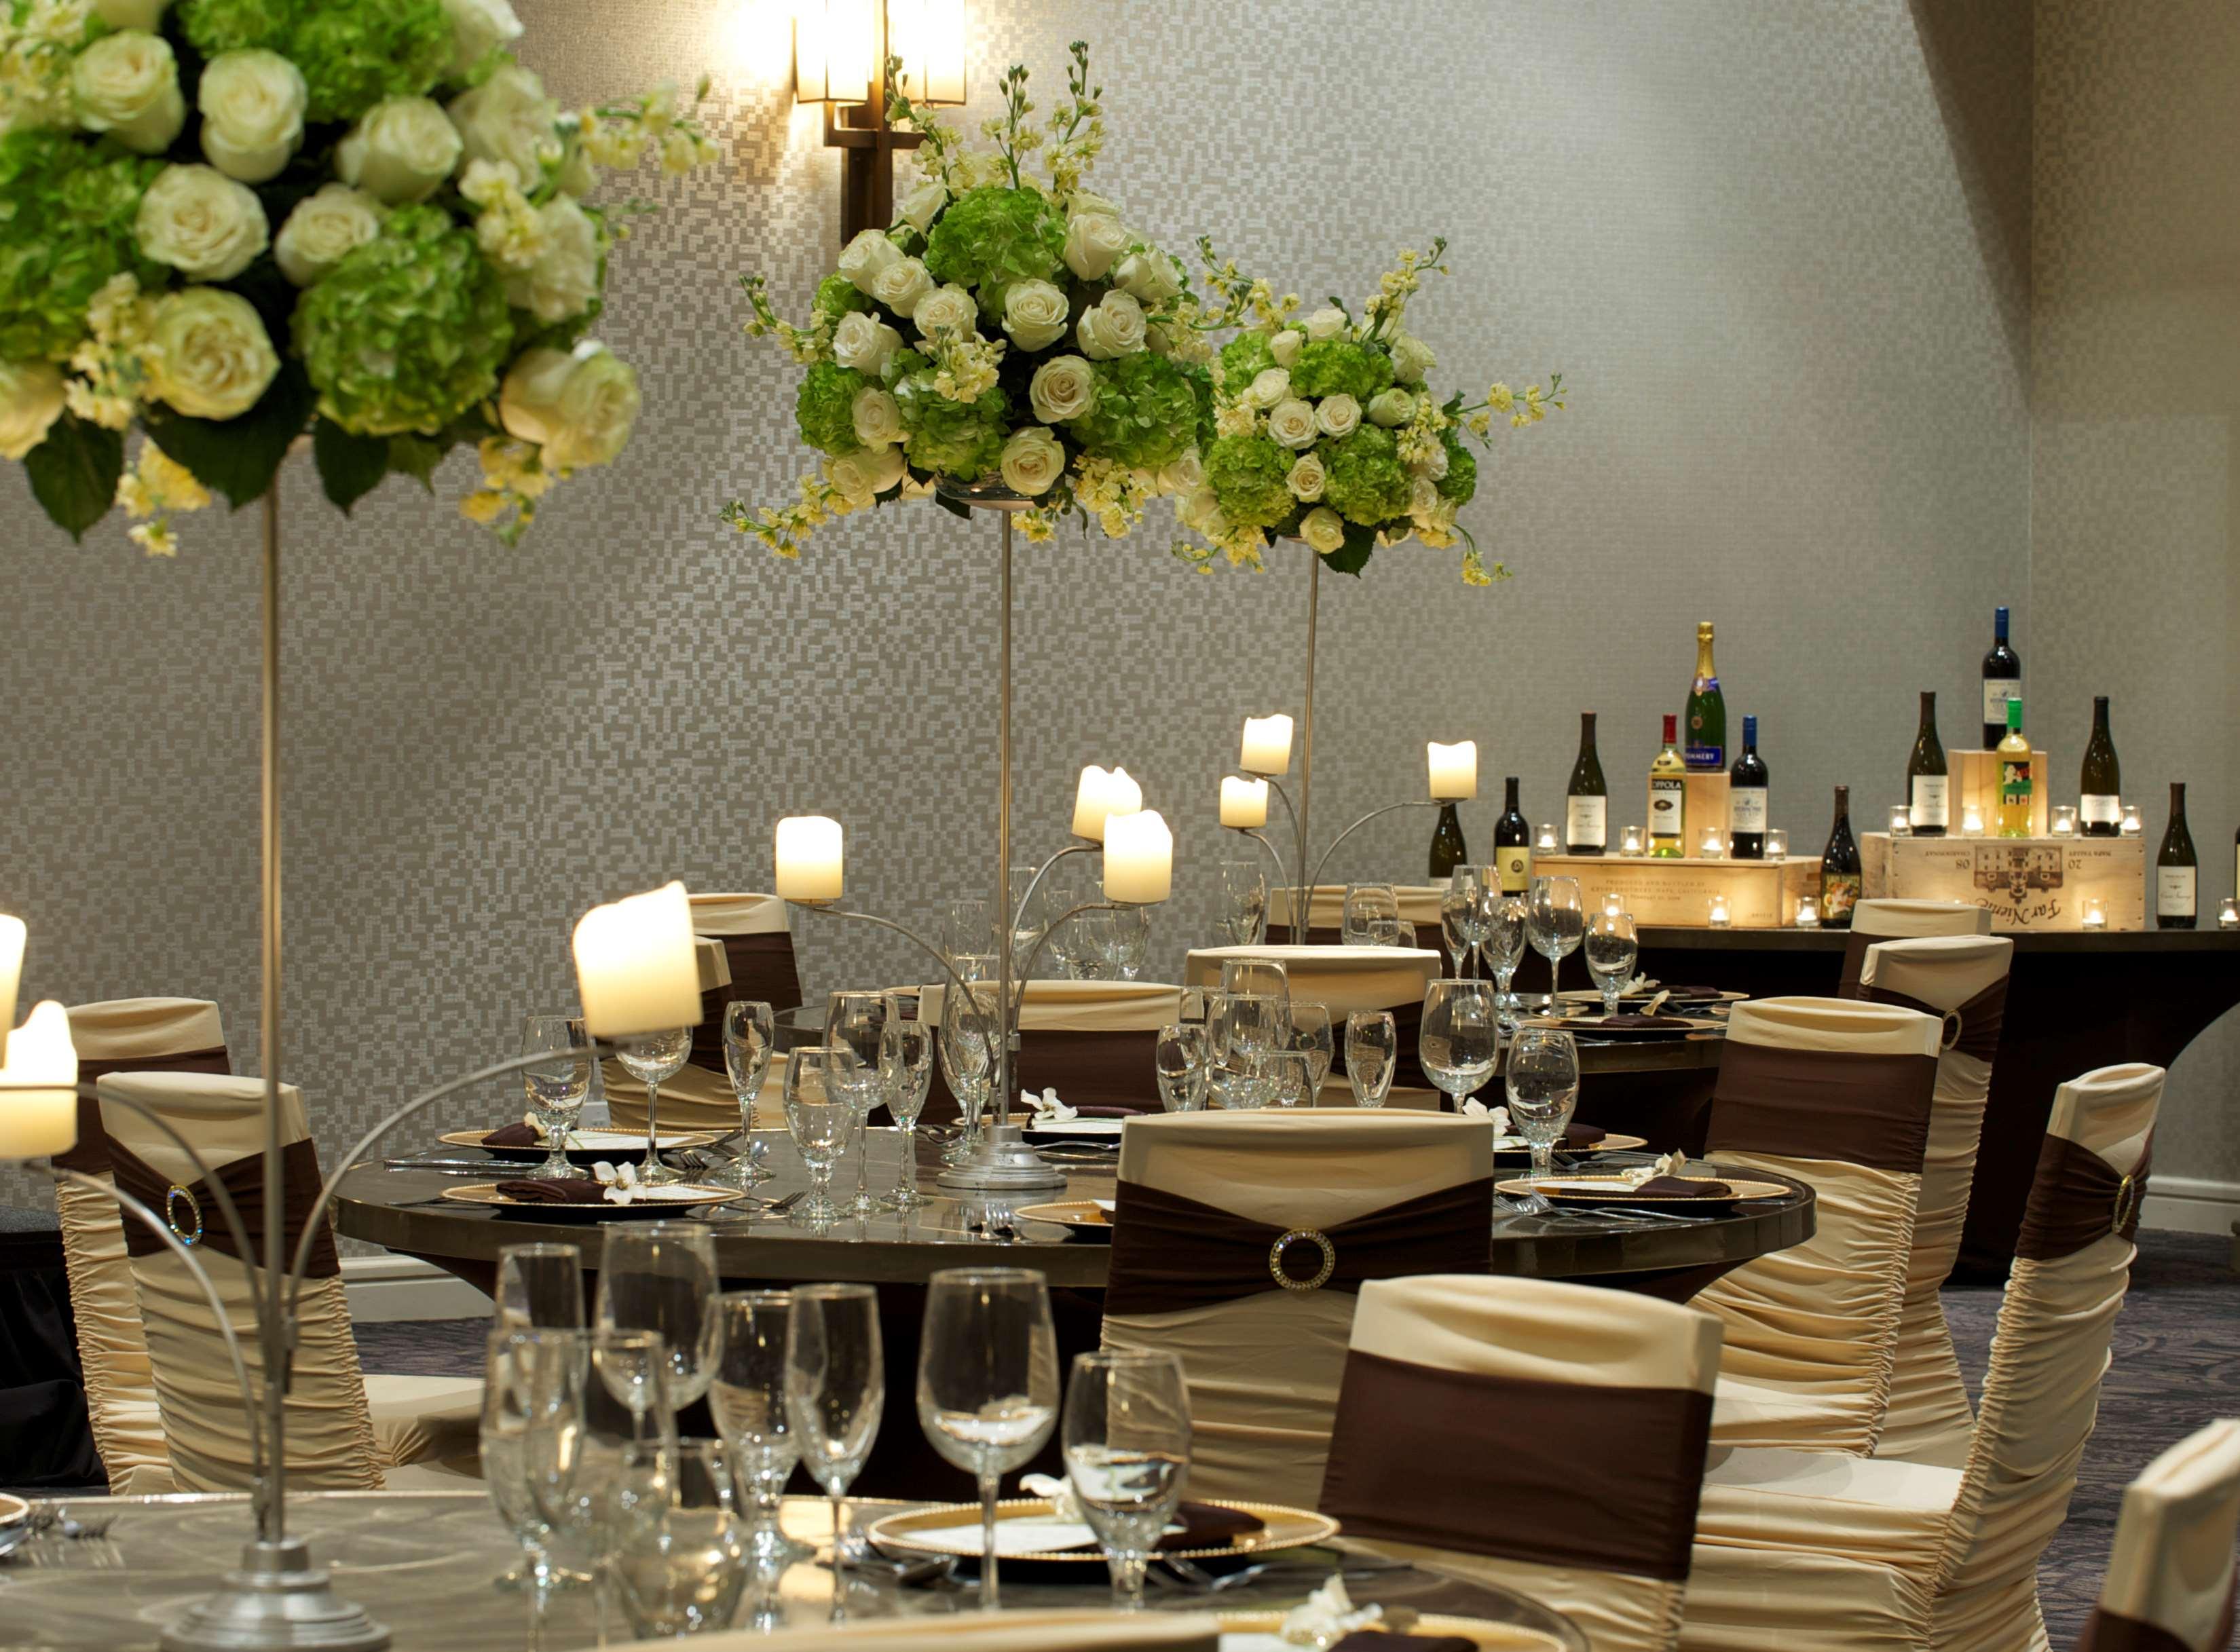 Verdea Restaurant And Wine Bar Palm Beach Gardens Fl